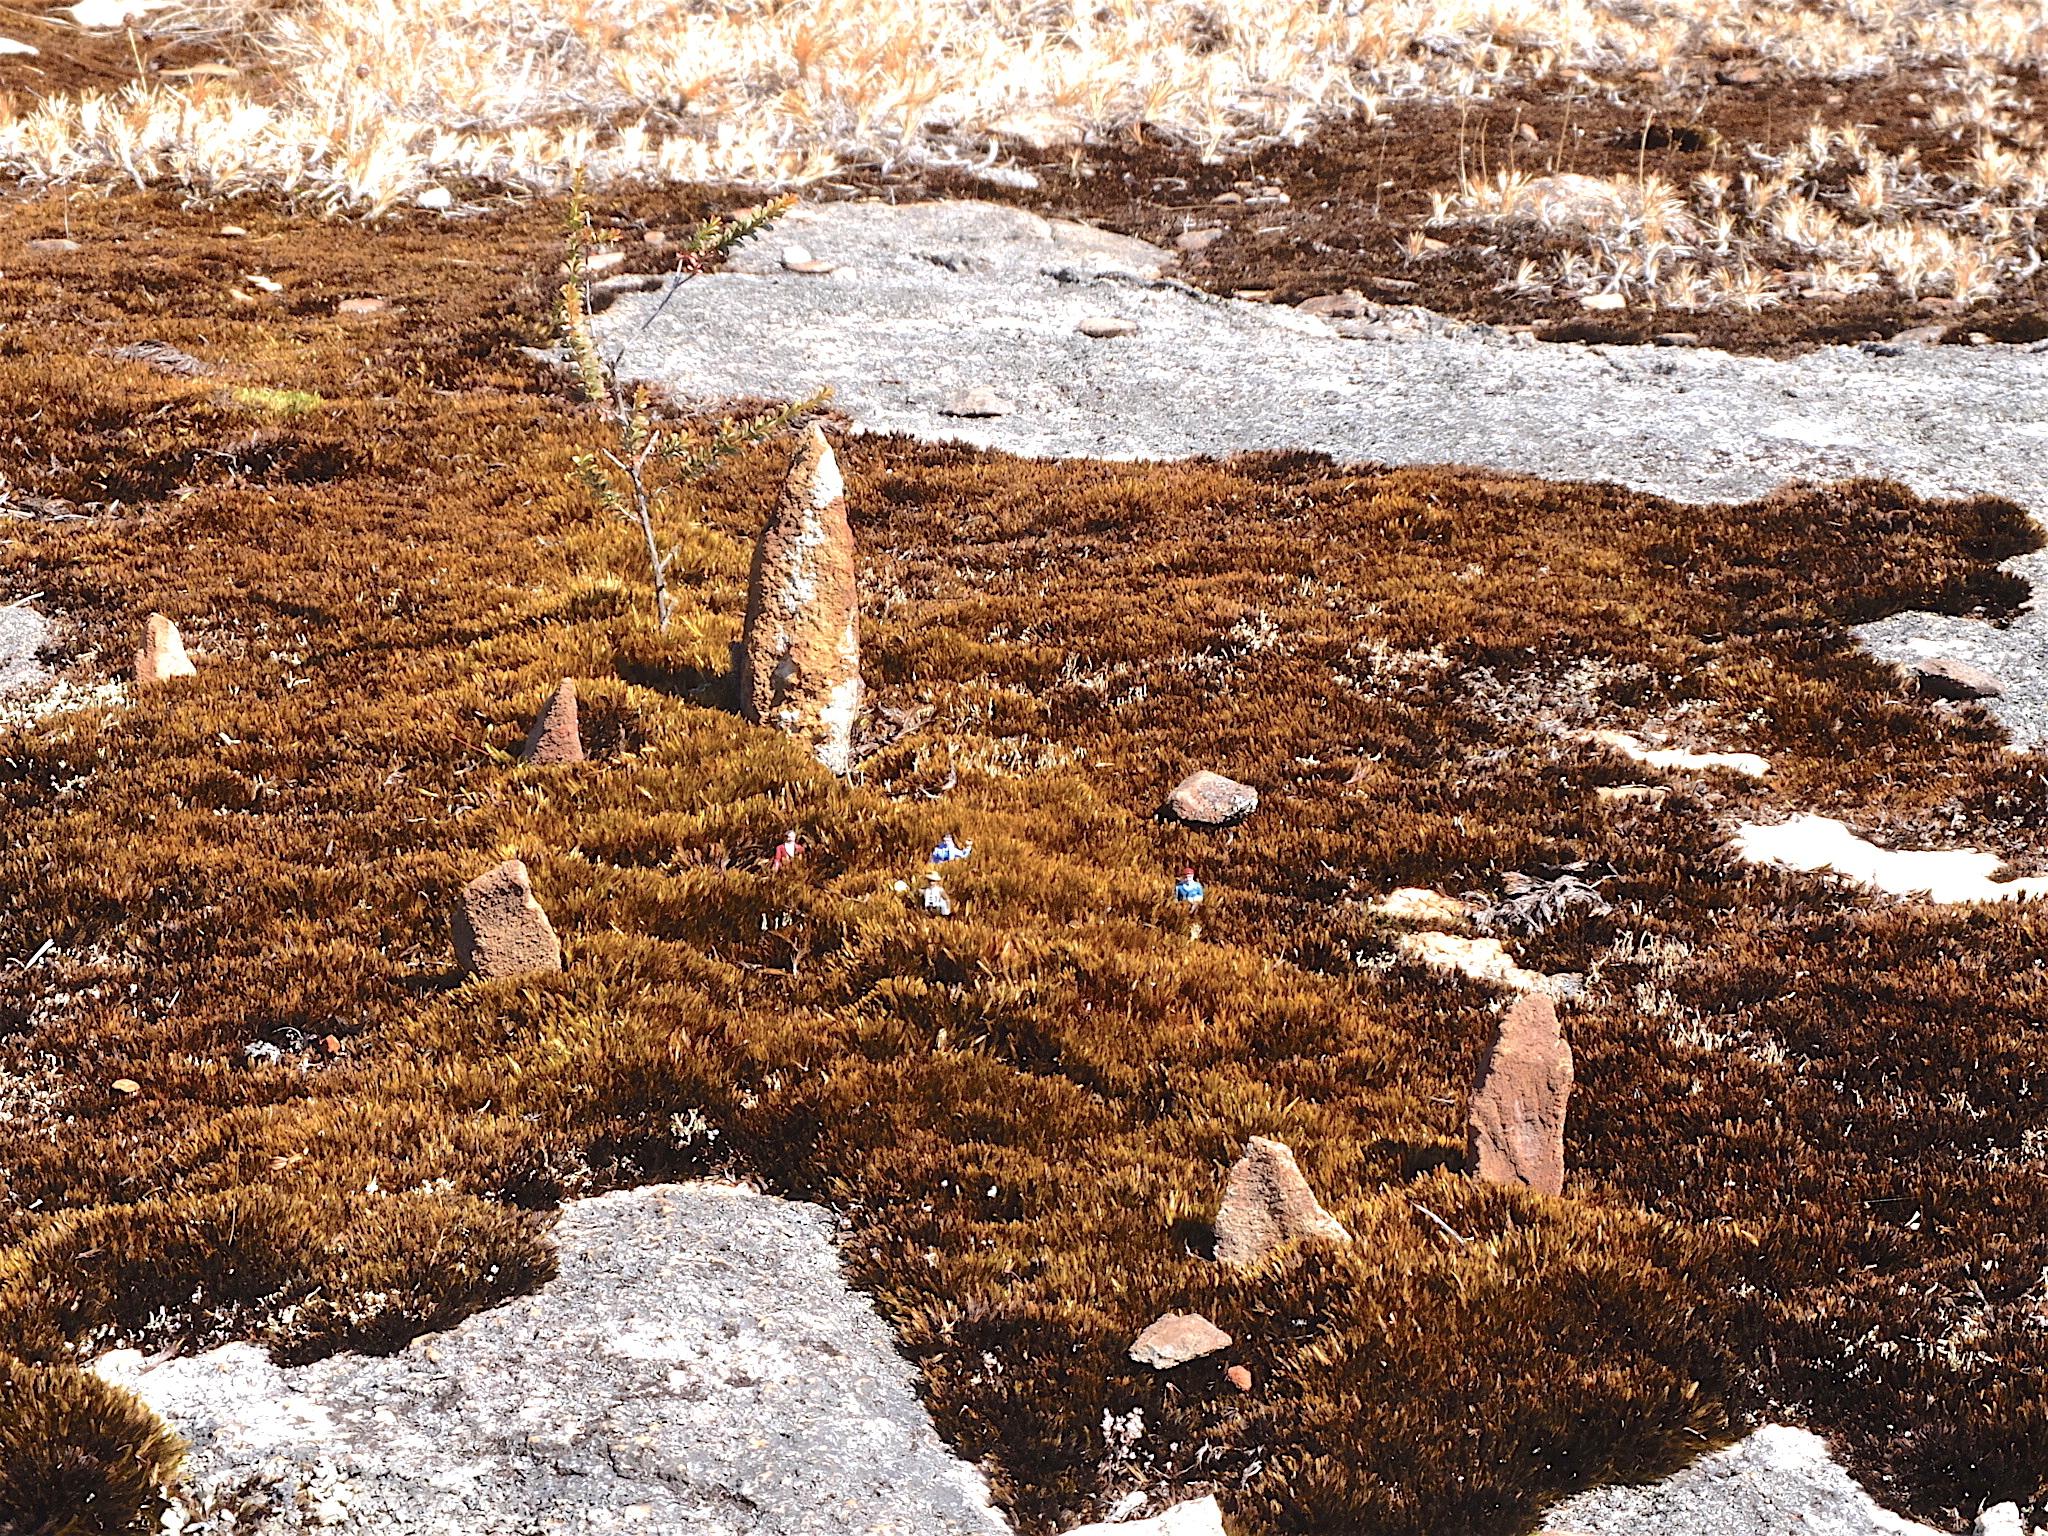 9. The Standing Stones